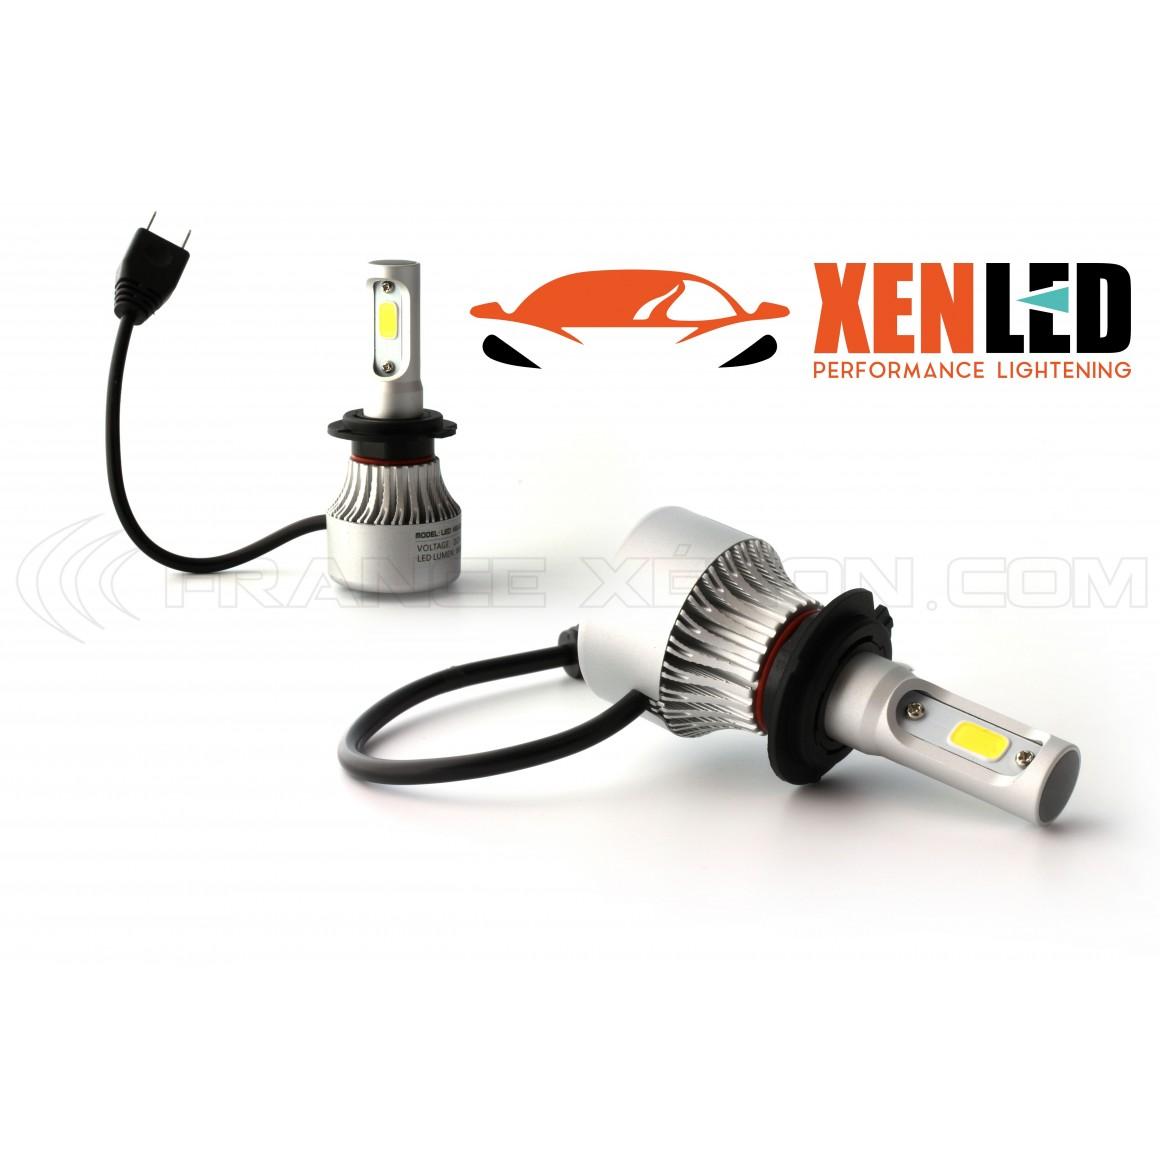 2 x lampadine h7 led headlight 75w 6500k france xenon for Lampadine h7 led